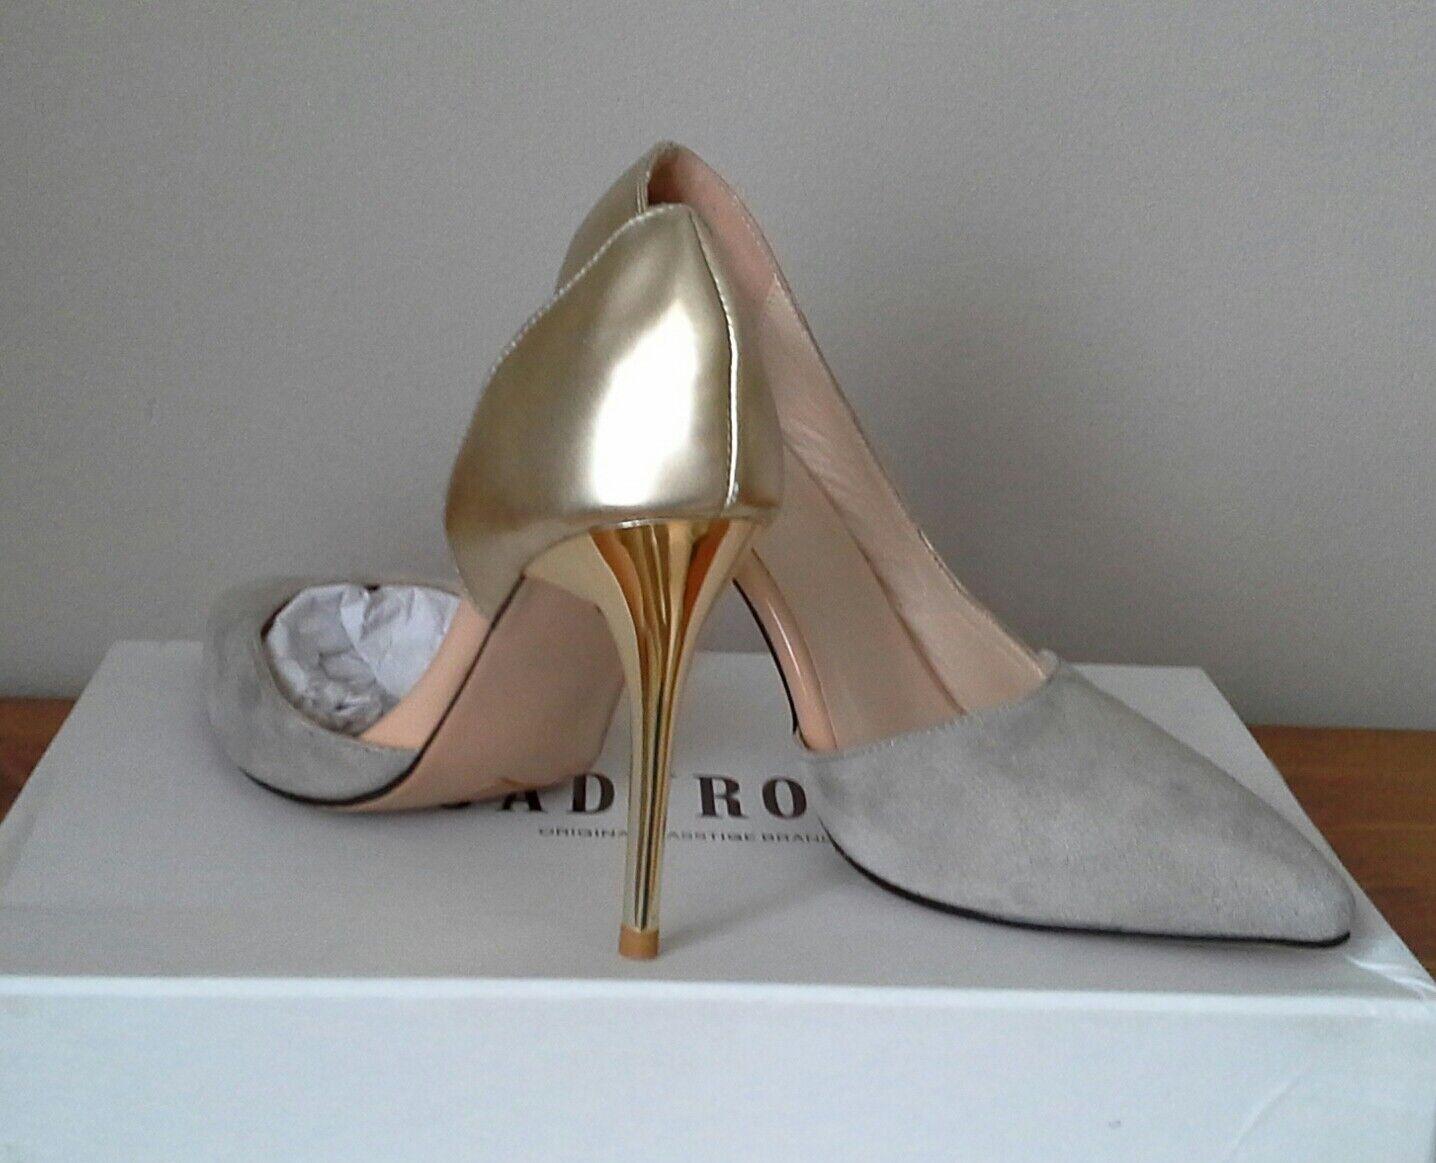 Damens Schuhes JADYROSE BNWB UK4.5 EU37 Grau Suede/Gold NEU Occasion Office Party